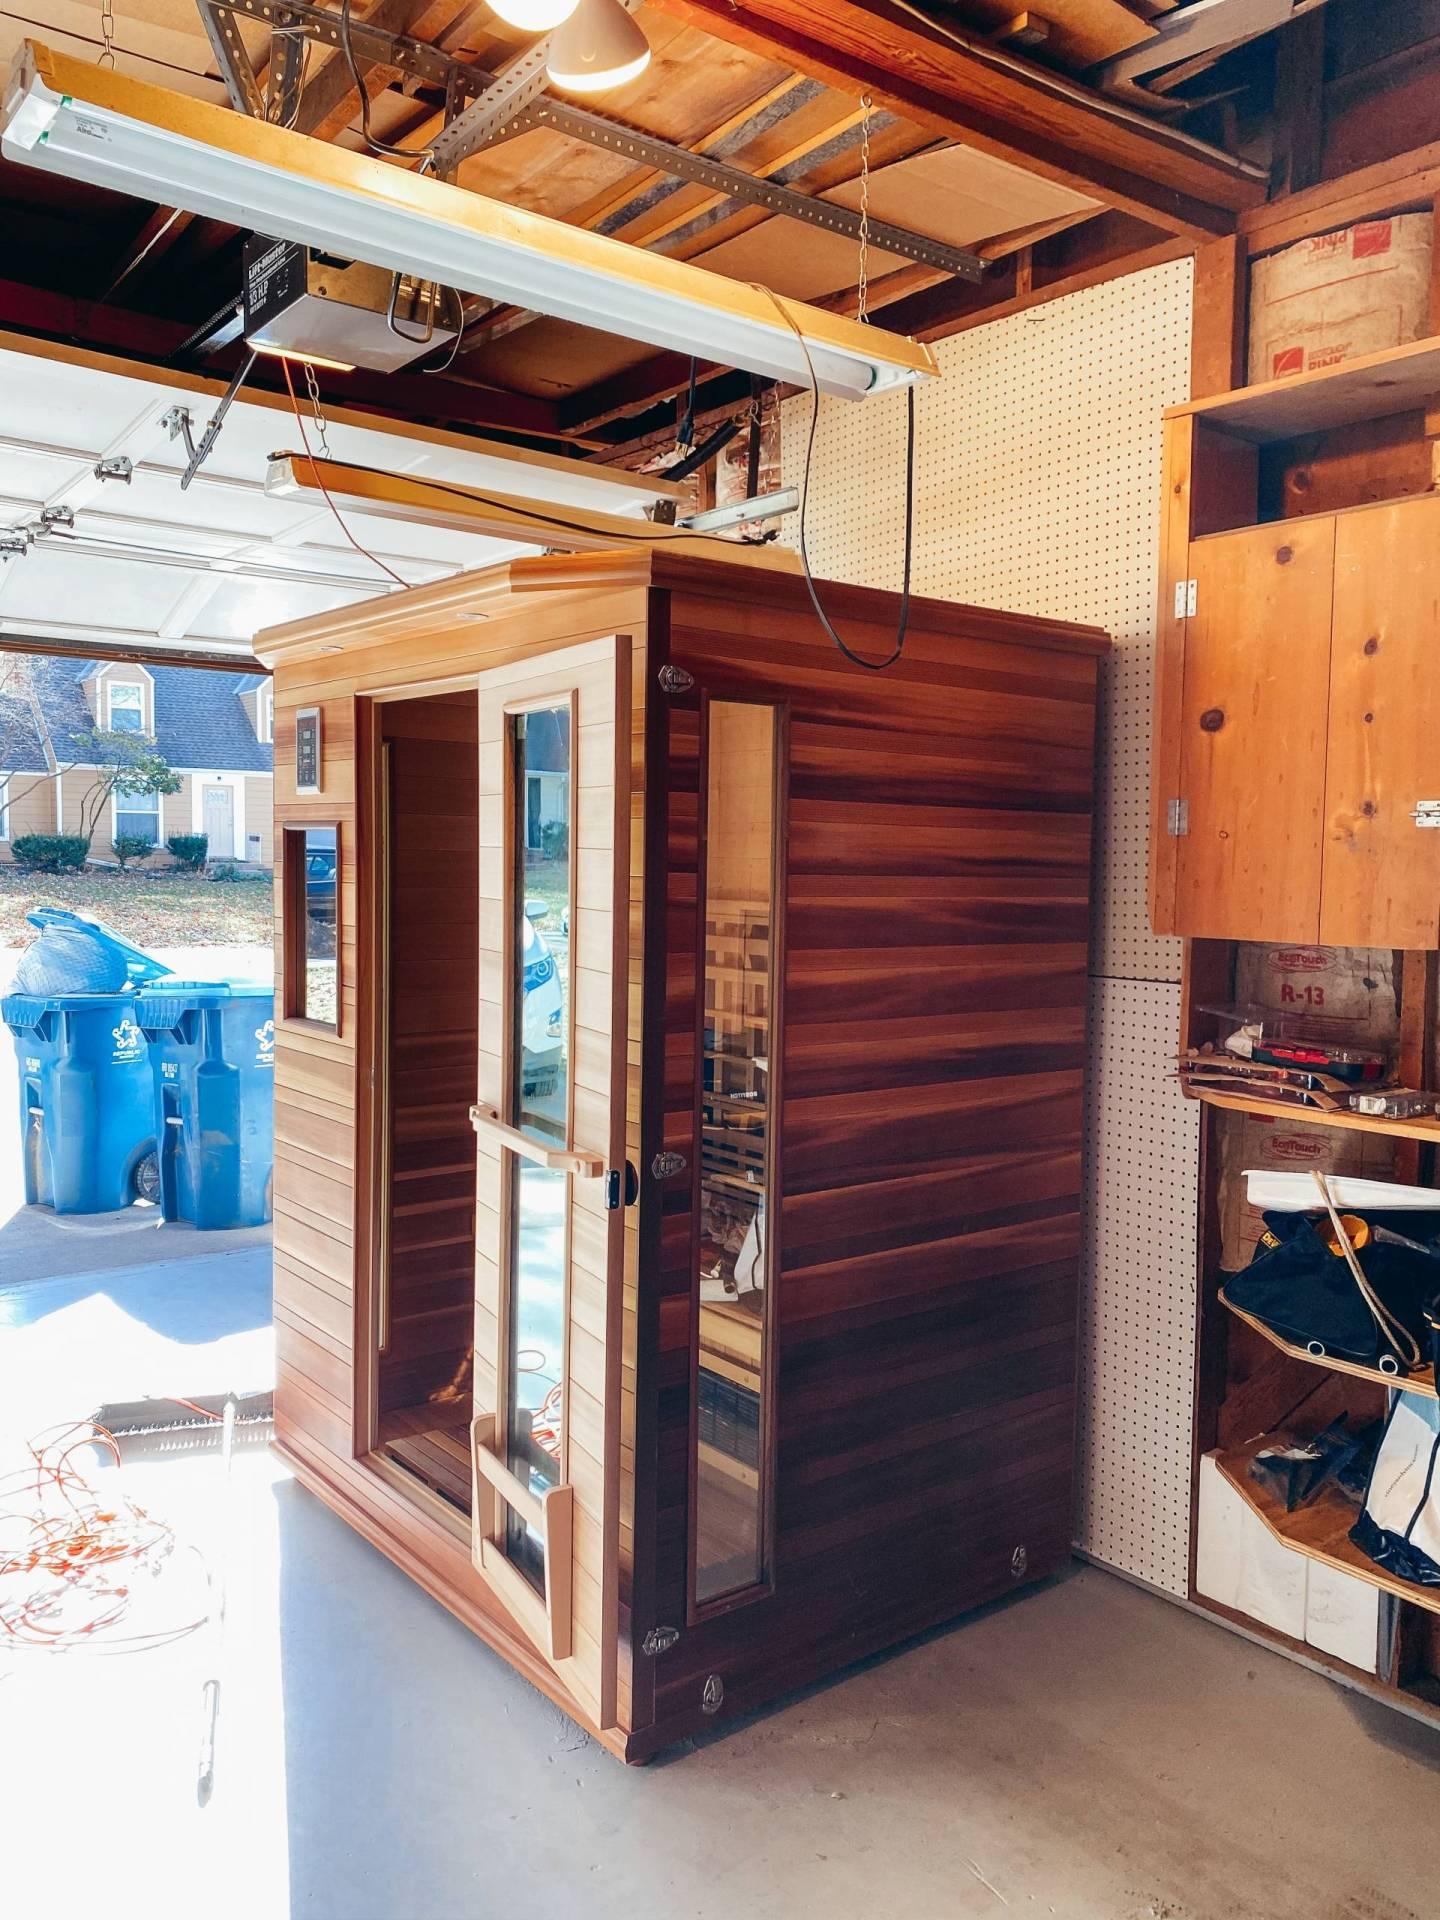 HealthMate Enrich 3 Sauna Review